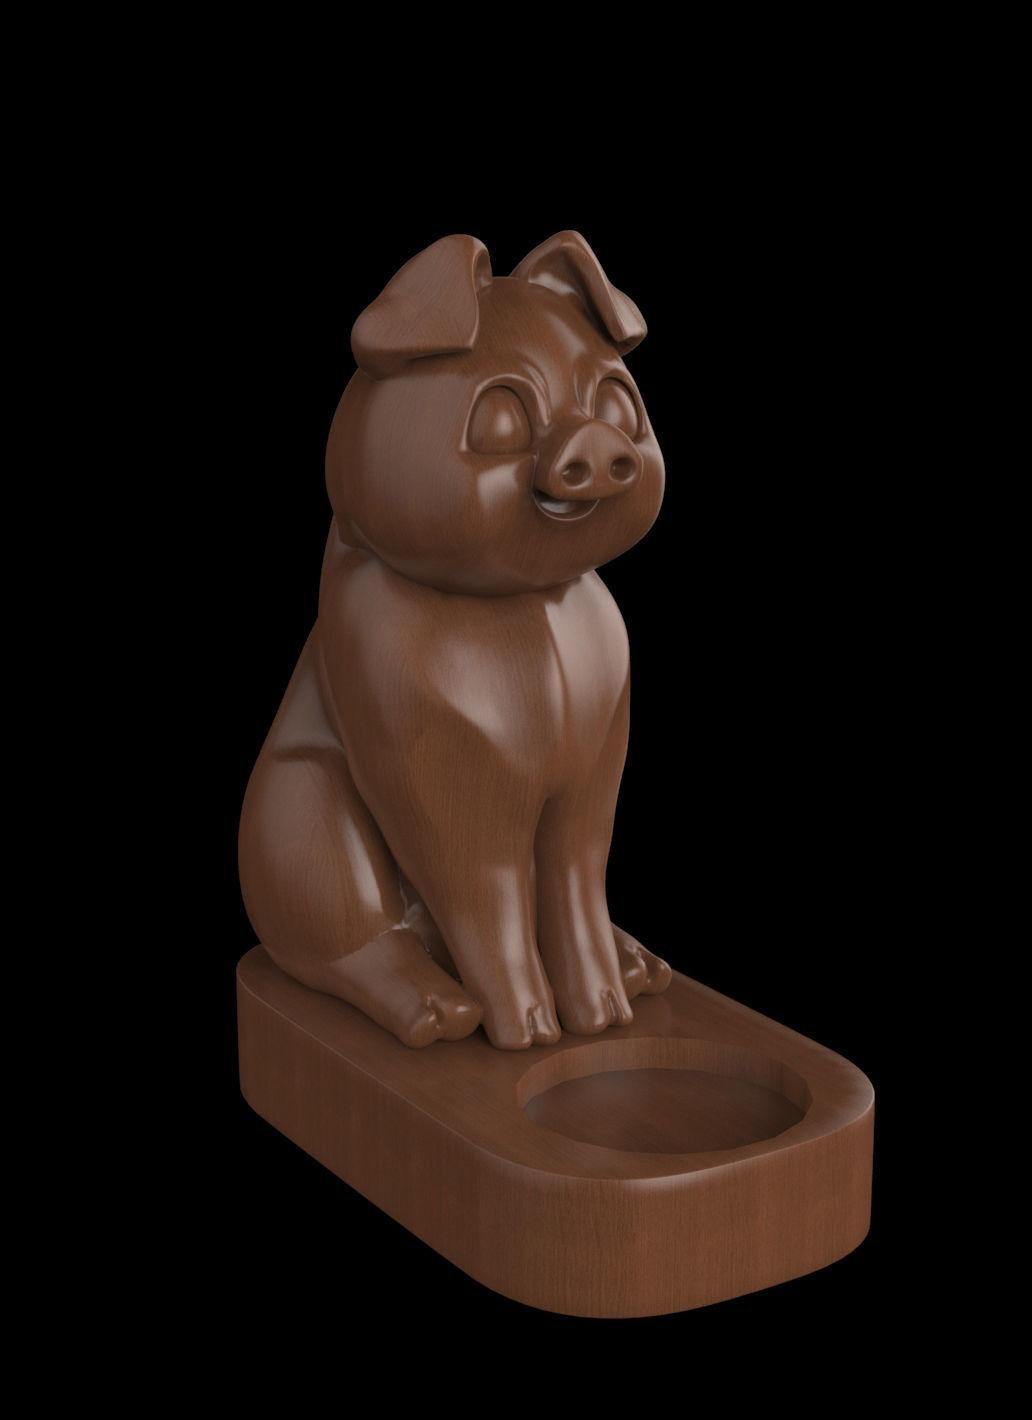 Figurine CNC 3D print model candlestick